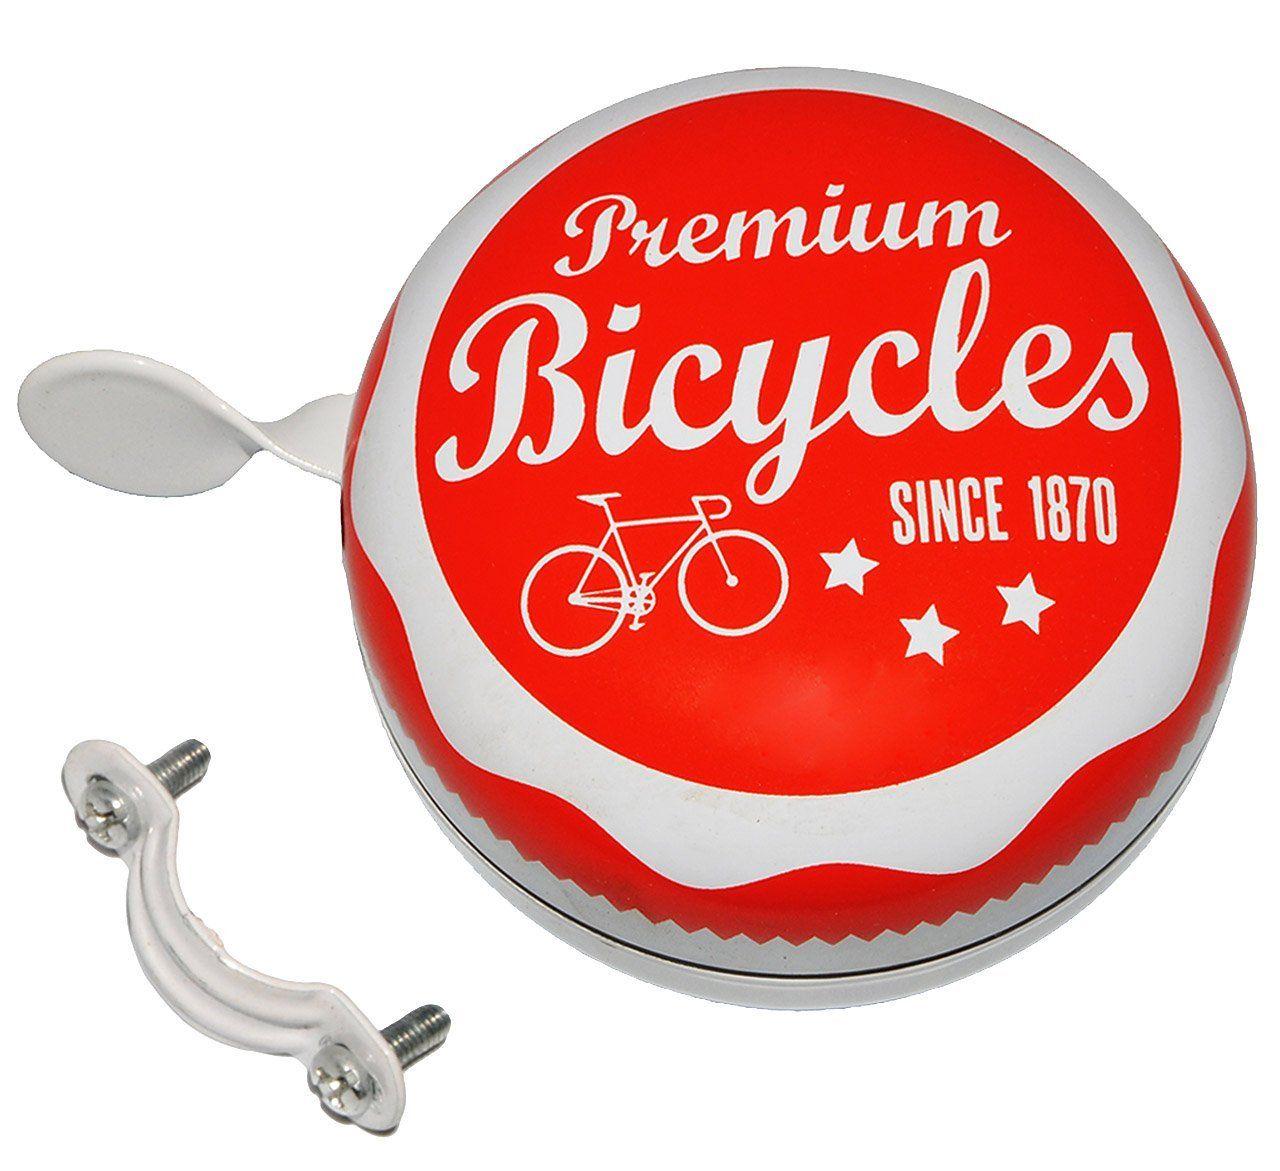 Vintage Metall-Klingel Fahrradklingel Fahrradglocke Premium Bicycles Since 1870